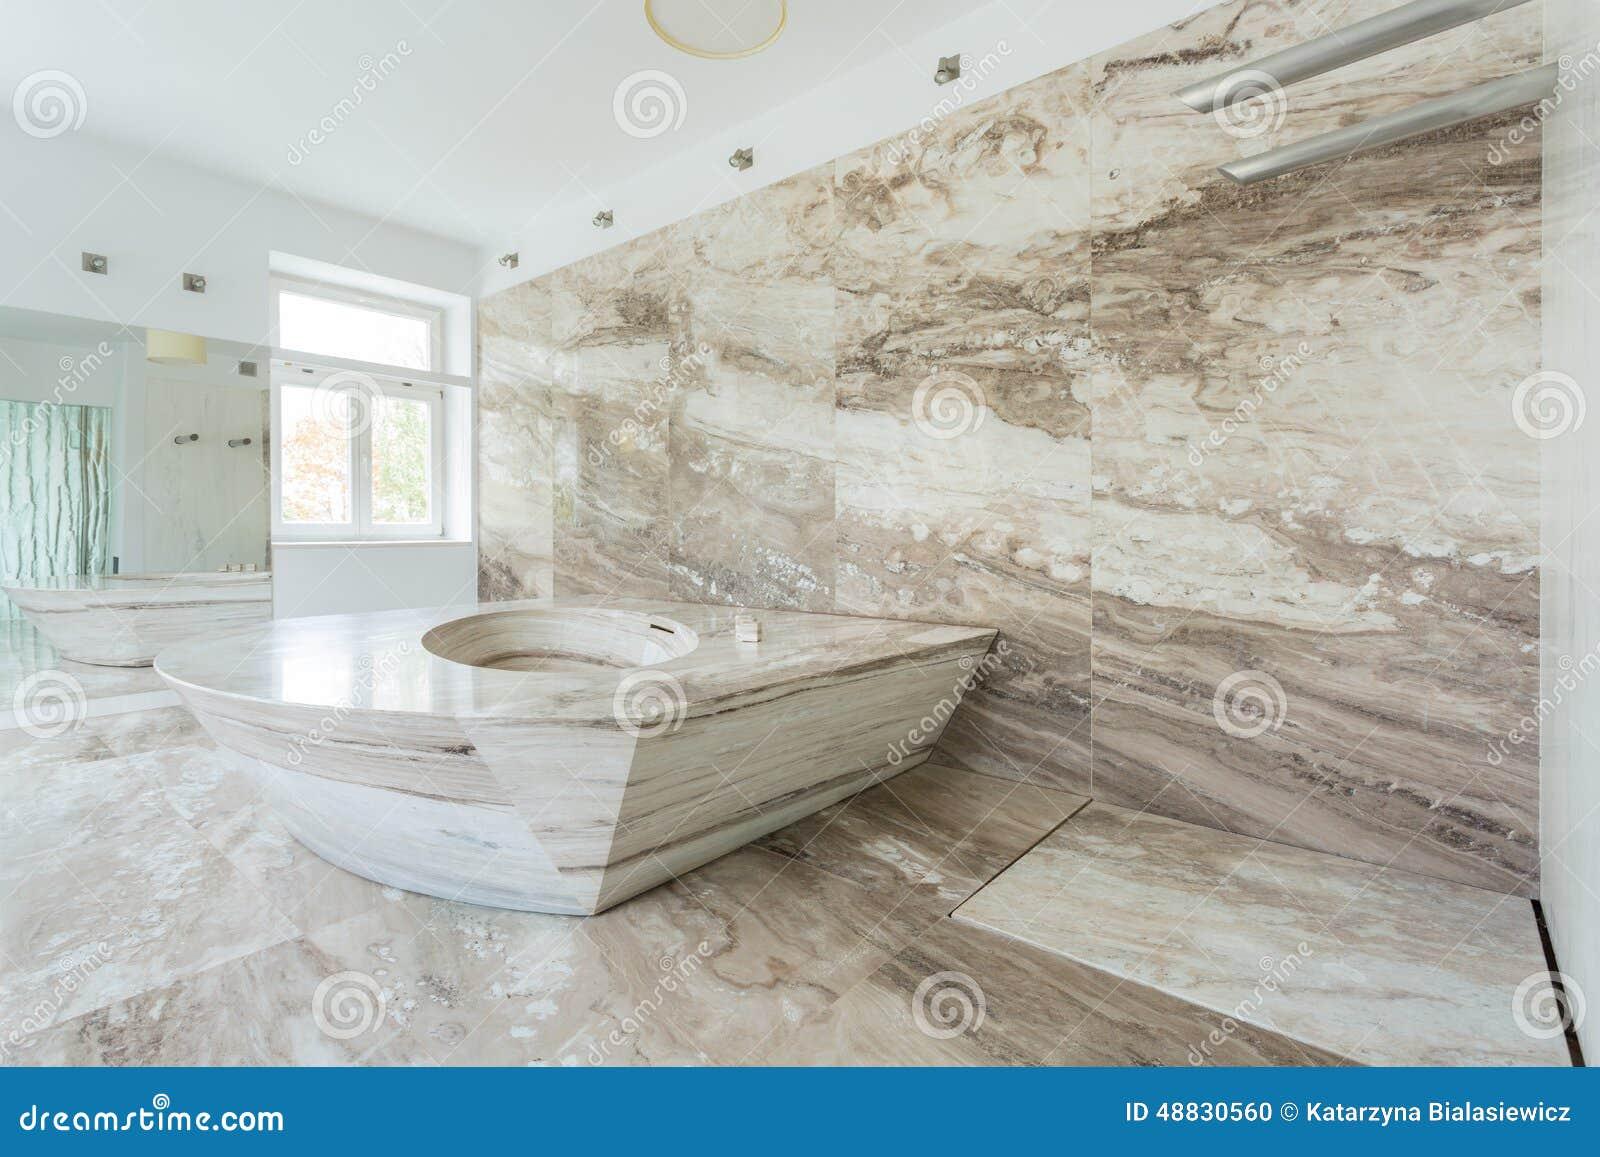 Porcelanosa prix salle de bain for Prix carrelage salle de bain